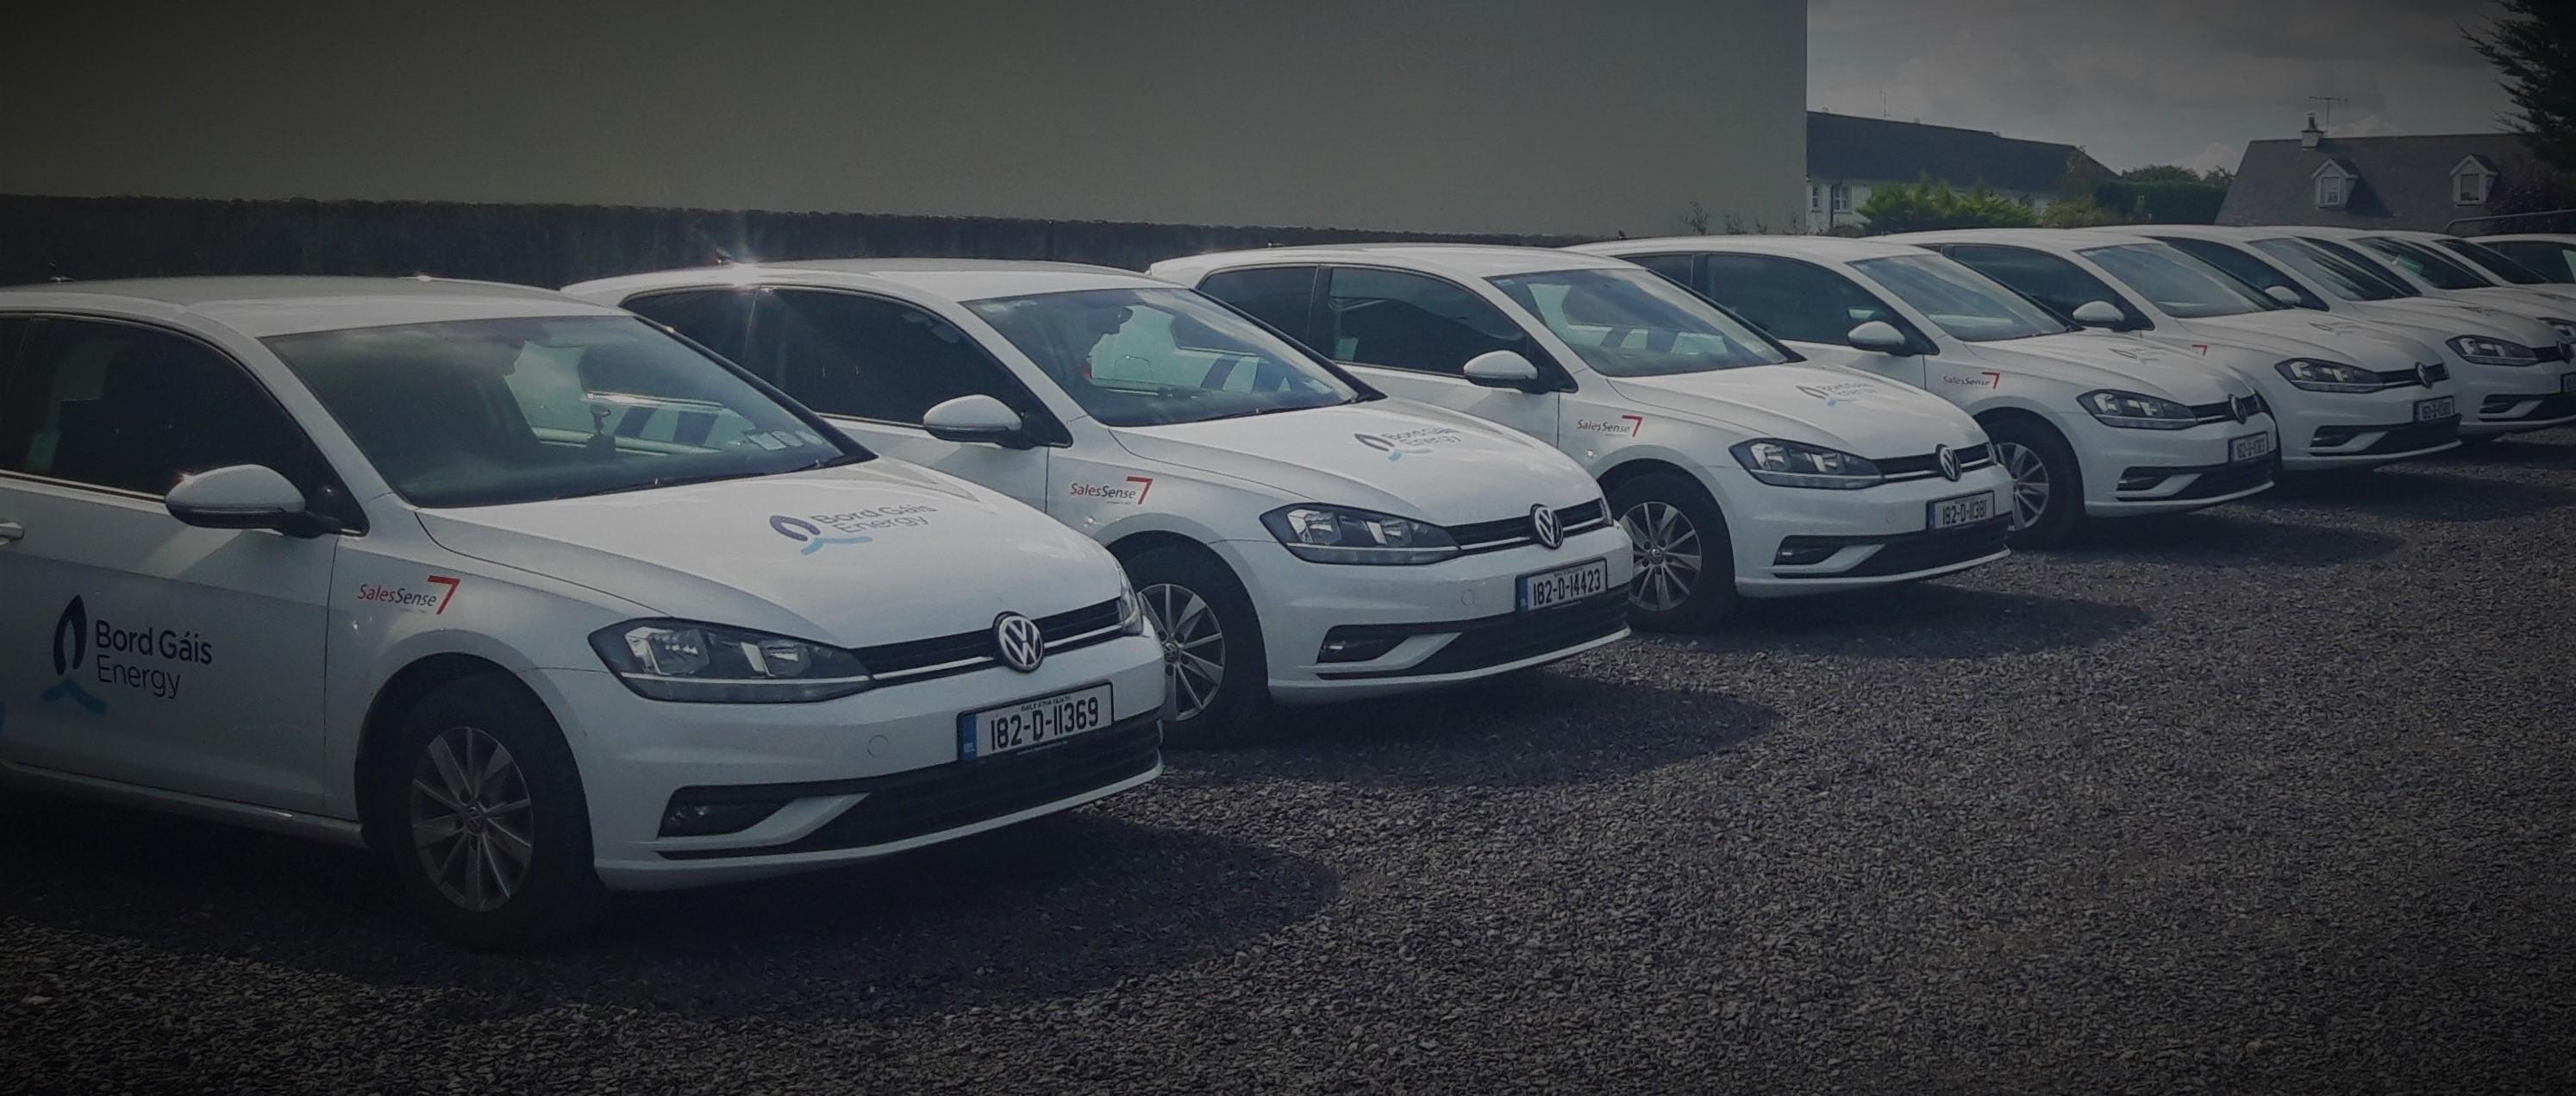 SalesSense fleet of cars